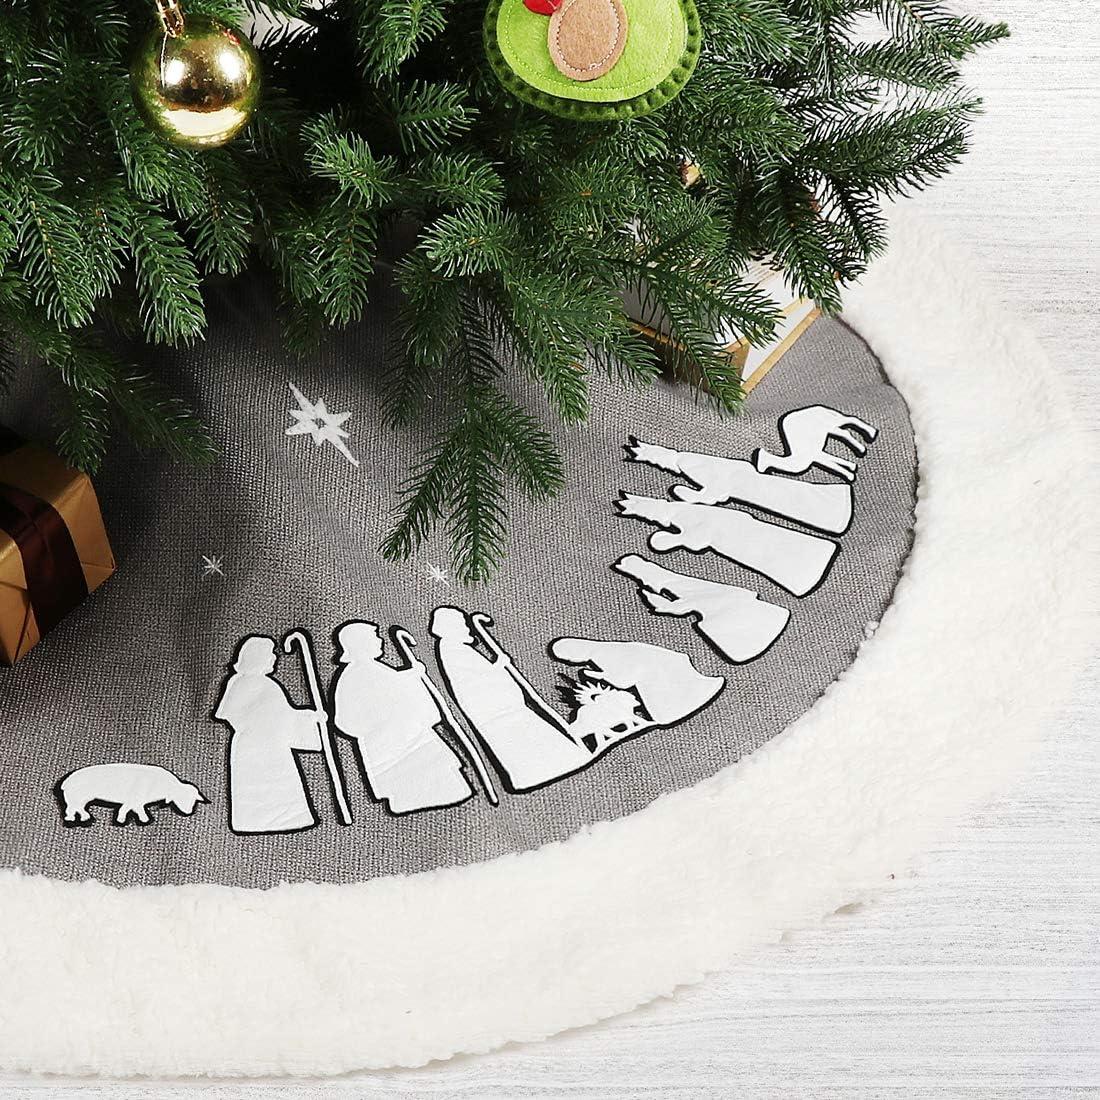 EDLDECCO Christmas Tree Skirt 48 Inches Grey Burlap Nativity Scene Holy Family Applique Faux Fur Trim Large X'Mas Holiday Party Decor Ornaments (Grey)